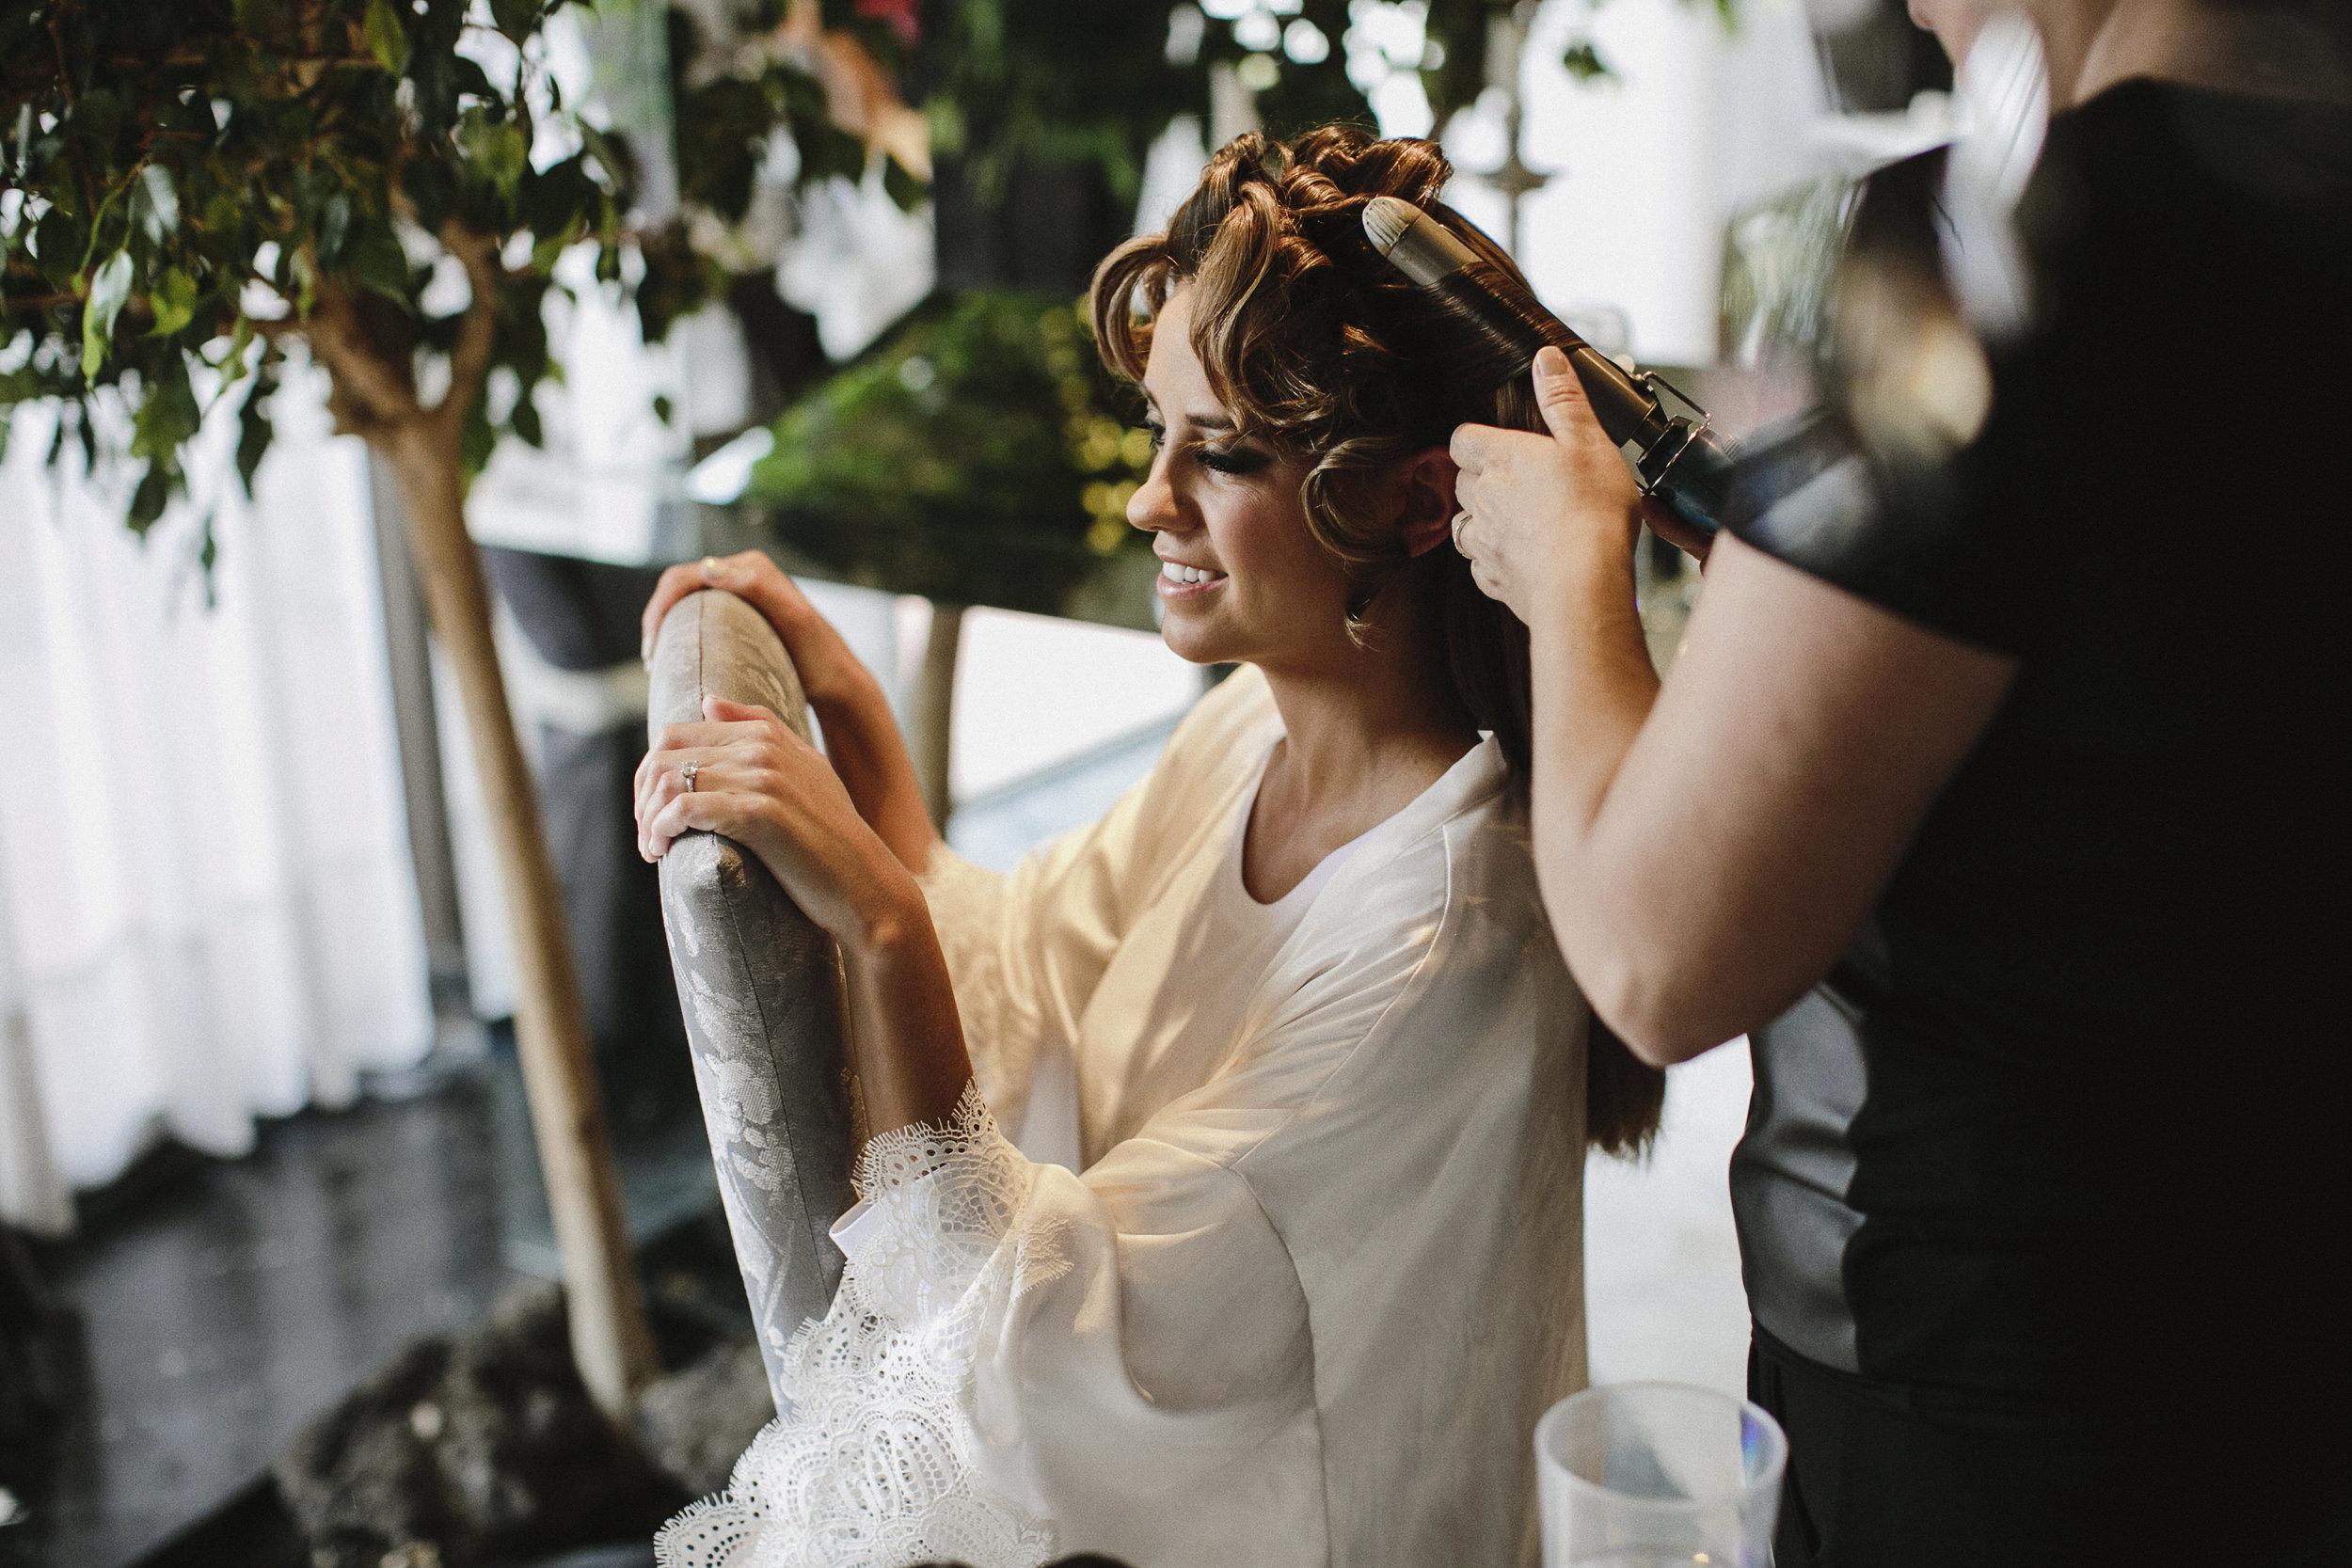 alfonso_flores_destination_wedding_photogrpahy_paola_alonso-50.JPG